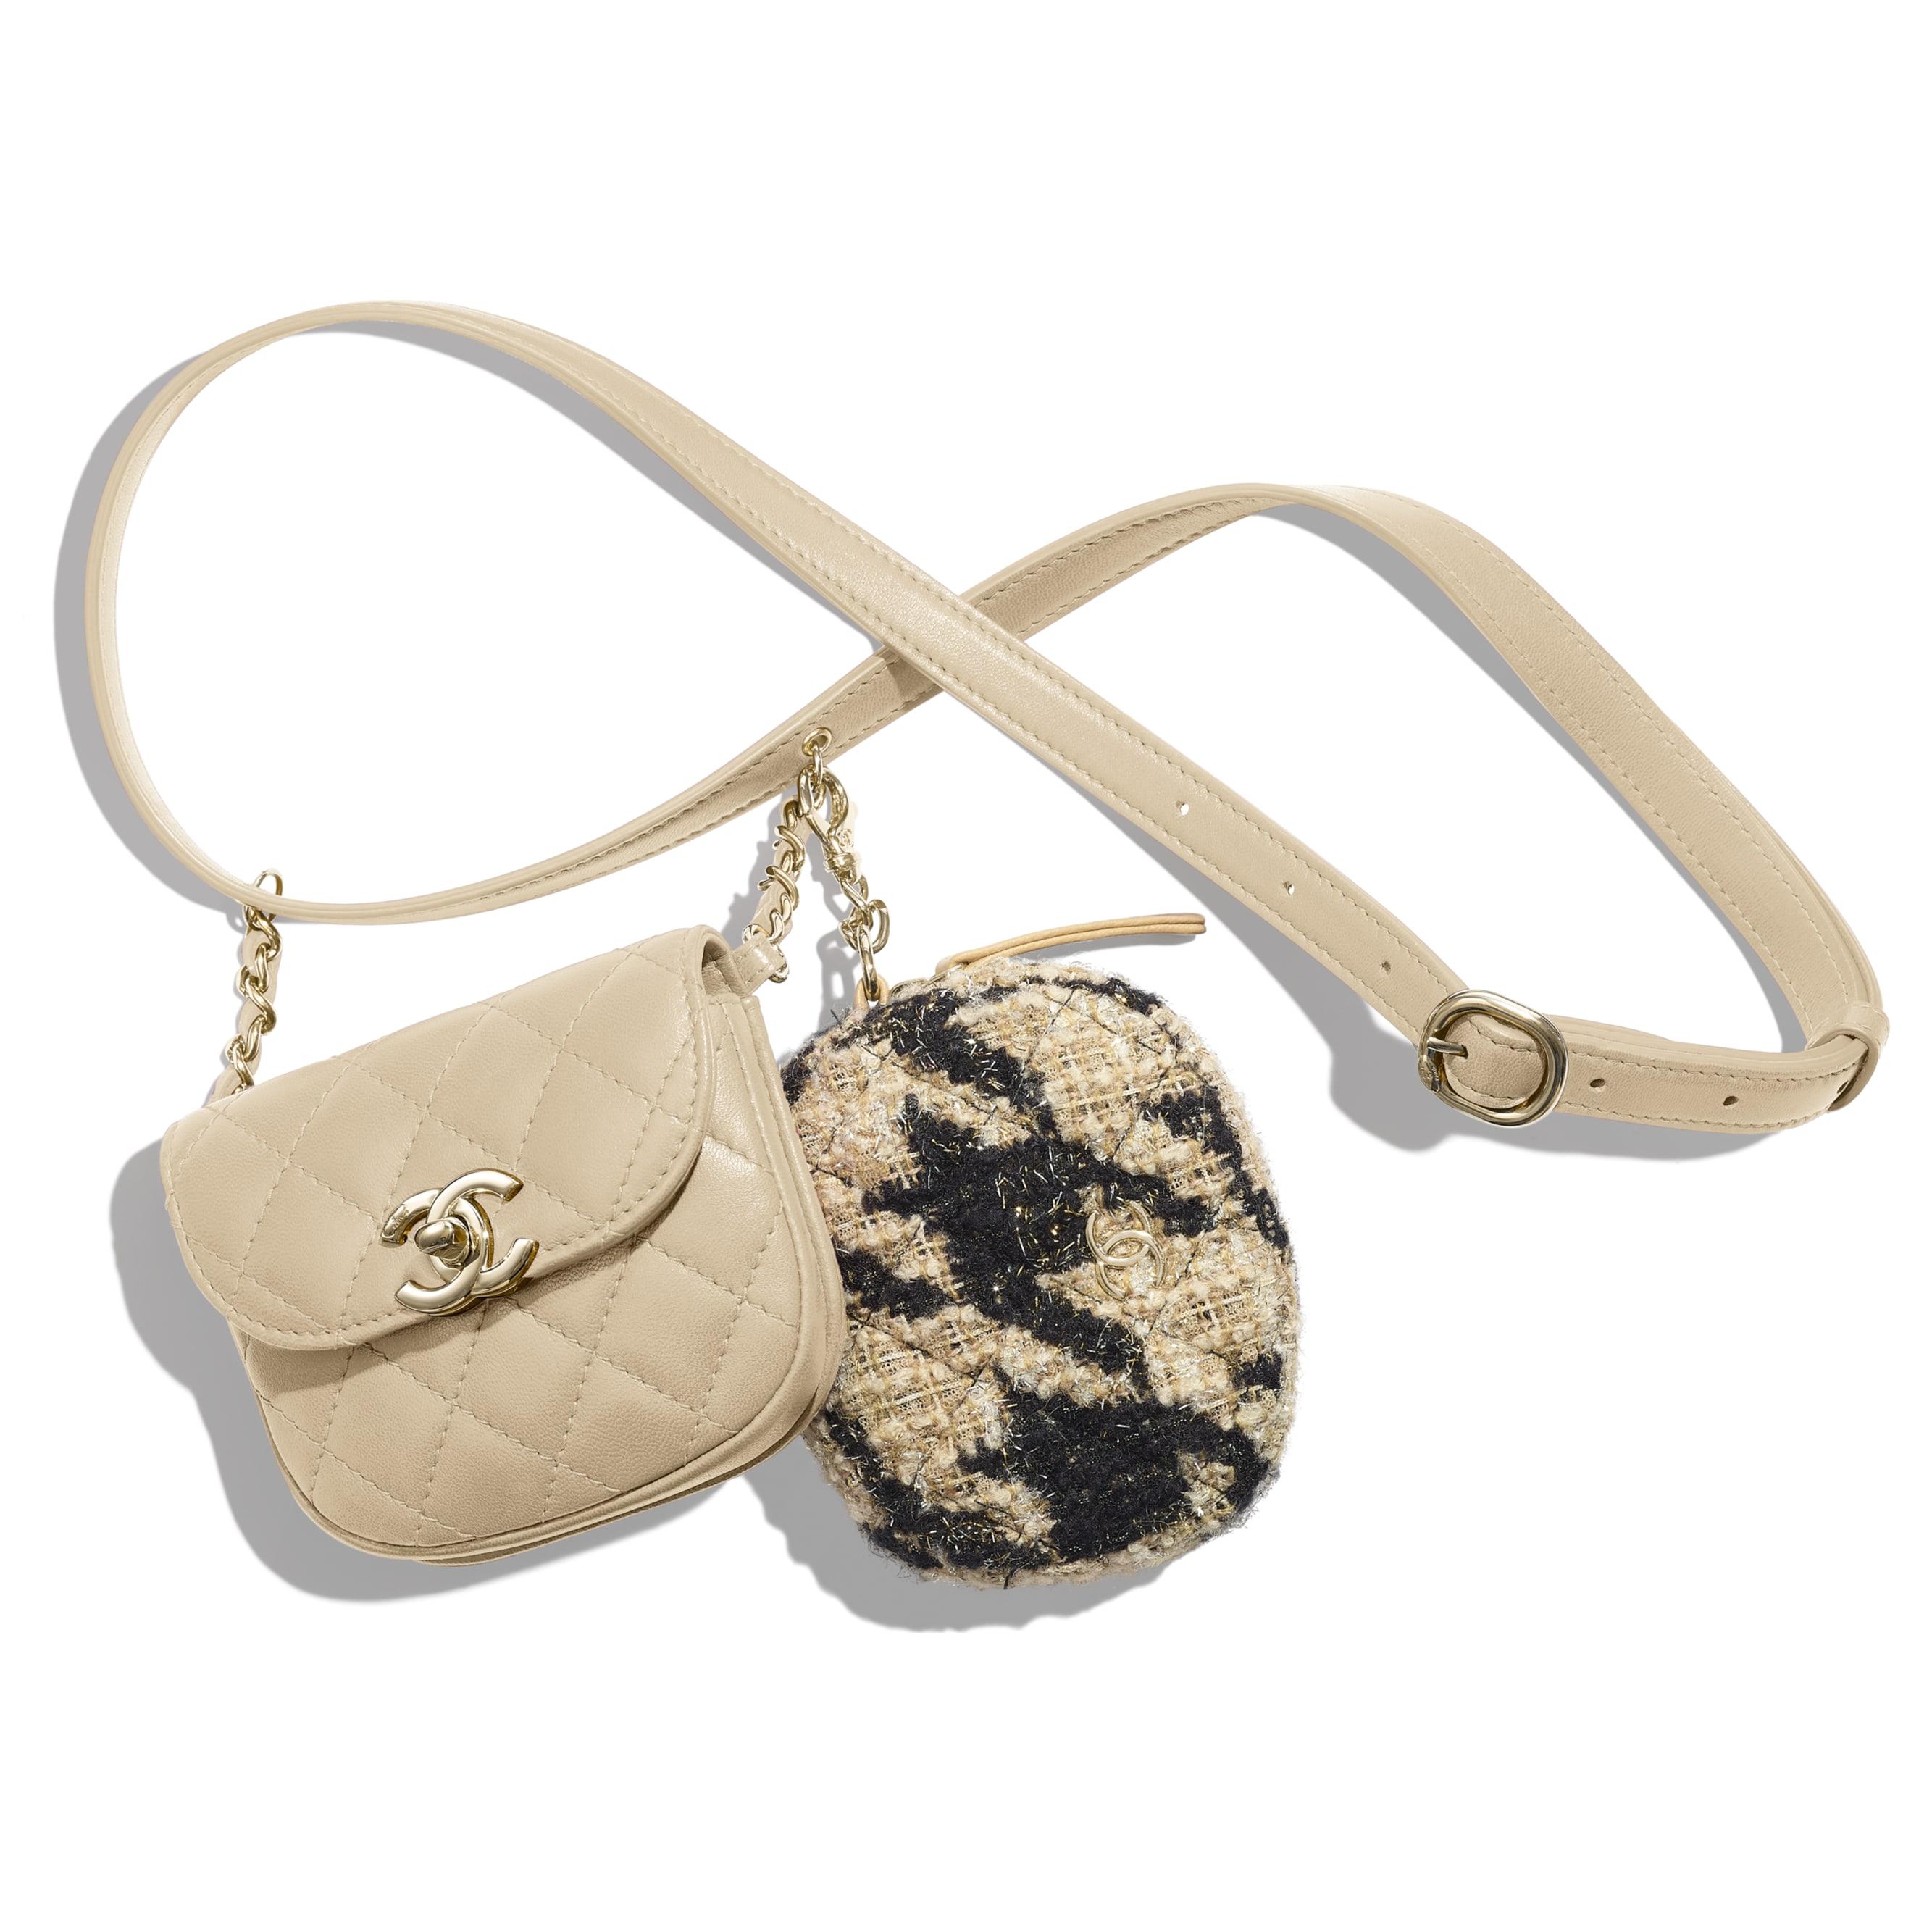 Waist Bag & Coin Purse - Beige & Black - Lambskin, Tweed & Gold-Tone Metal - Default view - see standard sized version